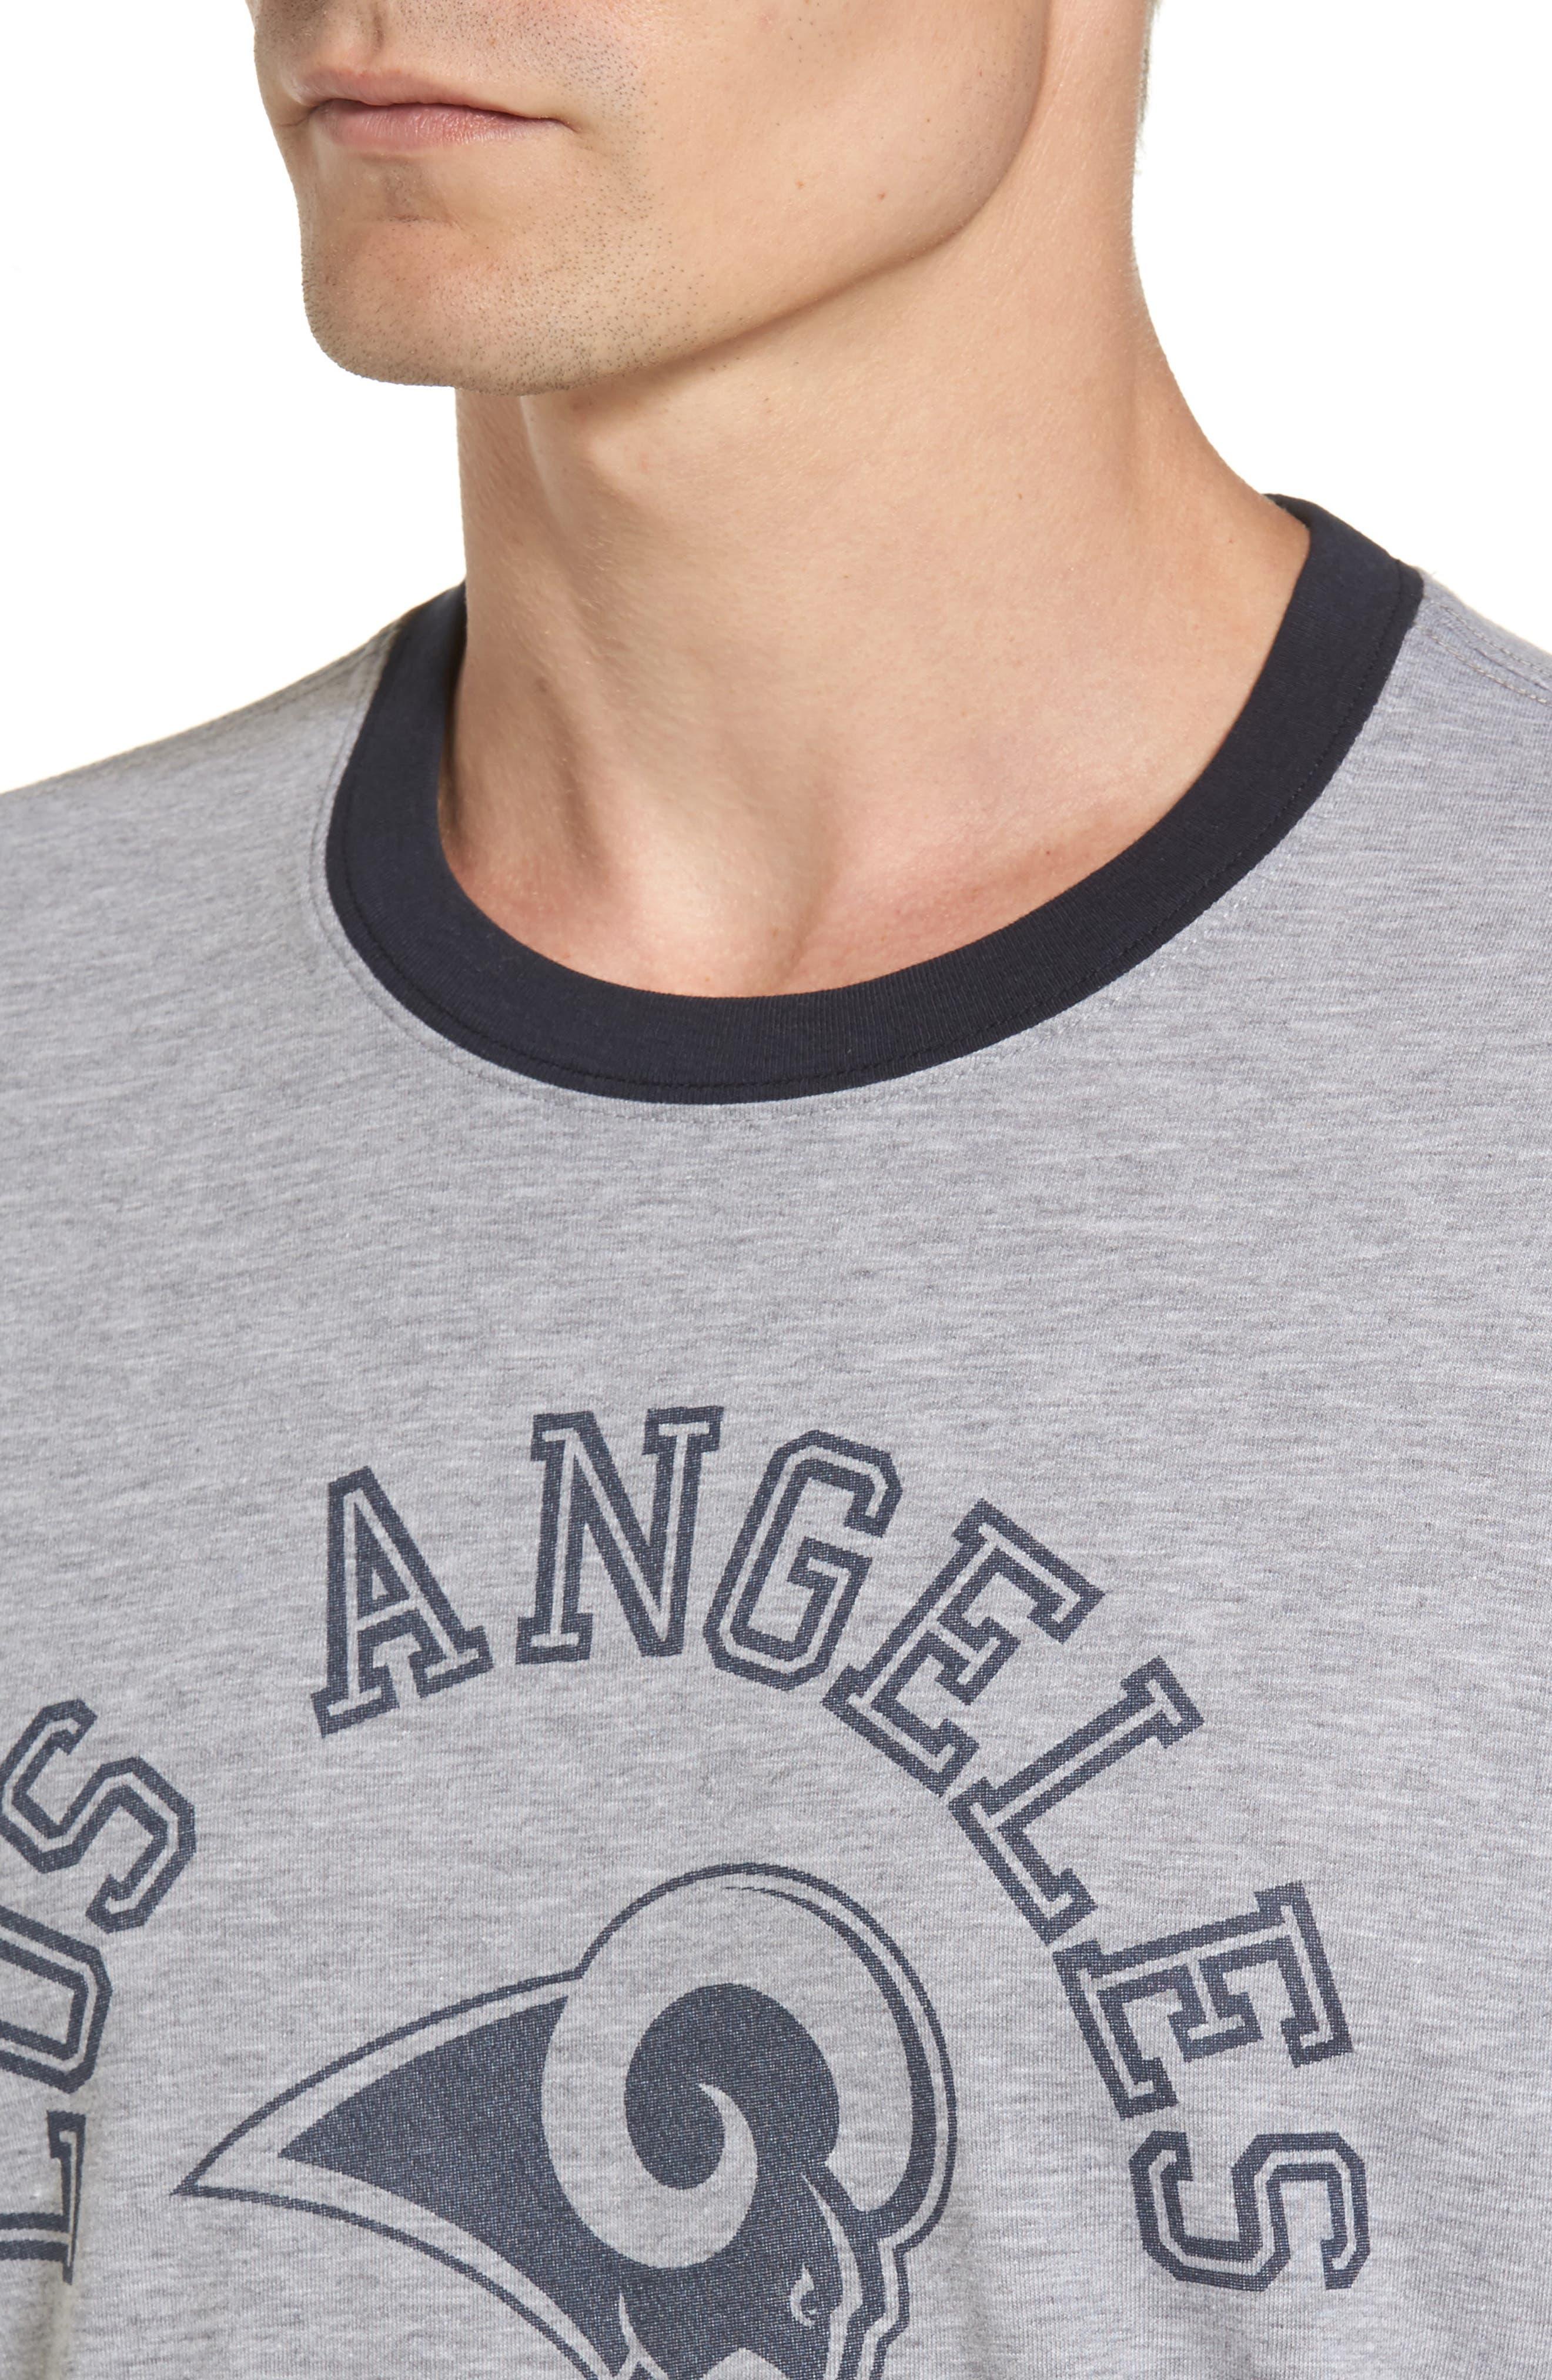 Los Angeles Rams Ringer T-Shirt,                             Alternate thumbnail 4, color,                             020